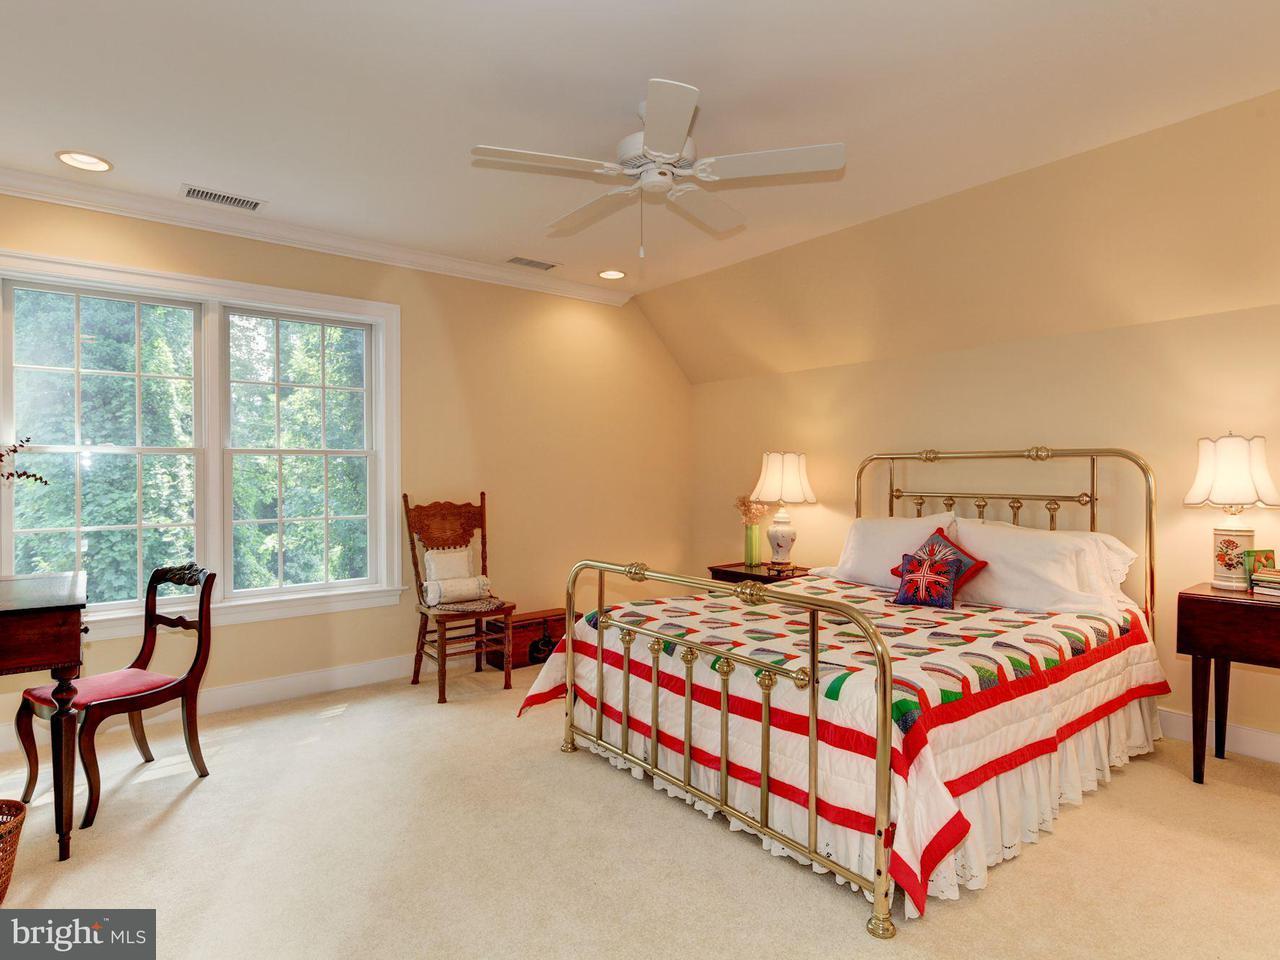 Additional photo for property listing at 805 Rackham Rd  Gibson Island, Maryland 21056 United States